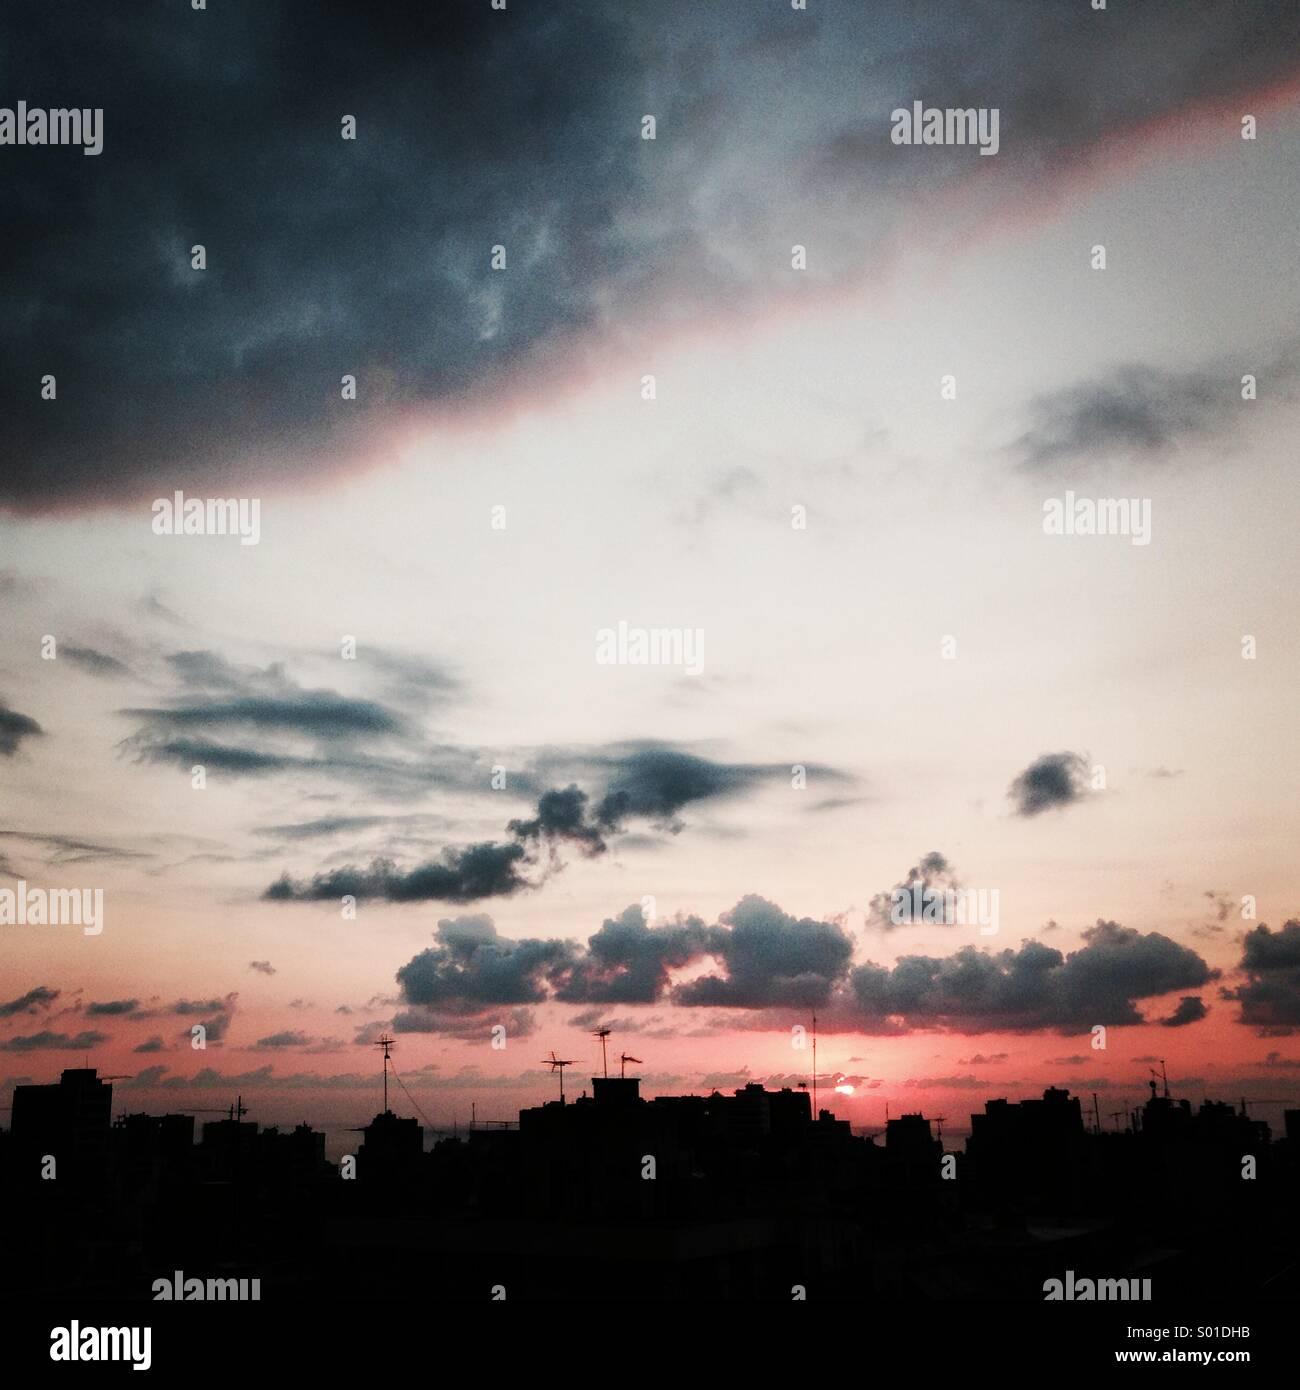 Paisaje urbano sunset - Beirut, Líbano - Oriente Medio Imagen De Stock